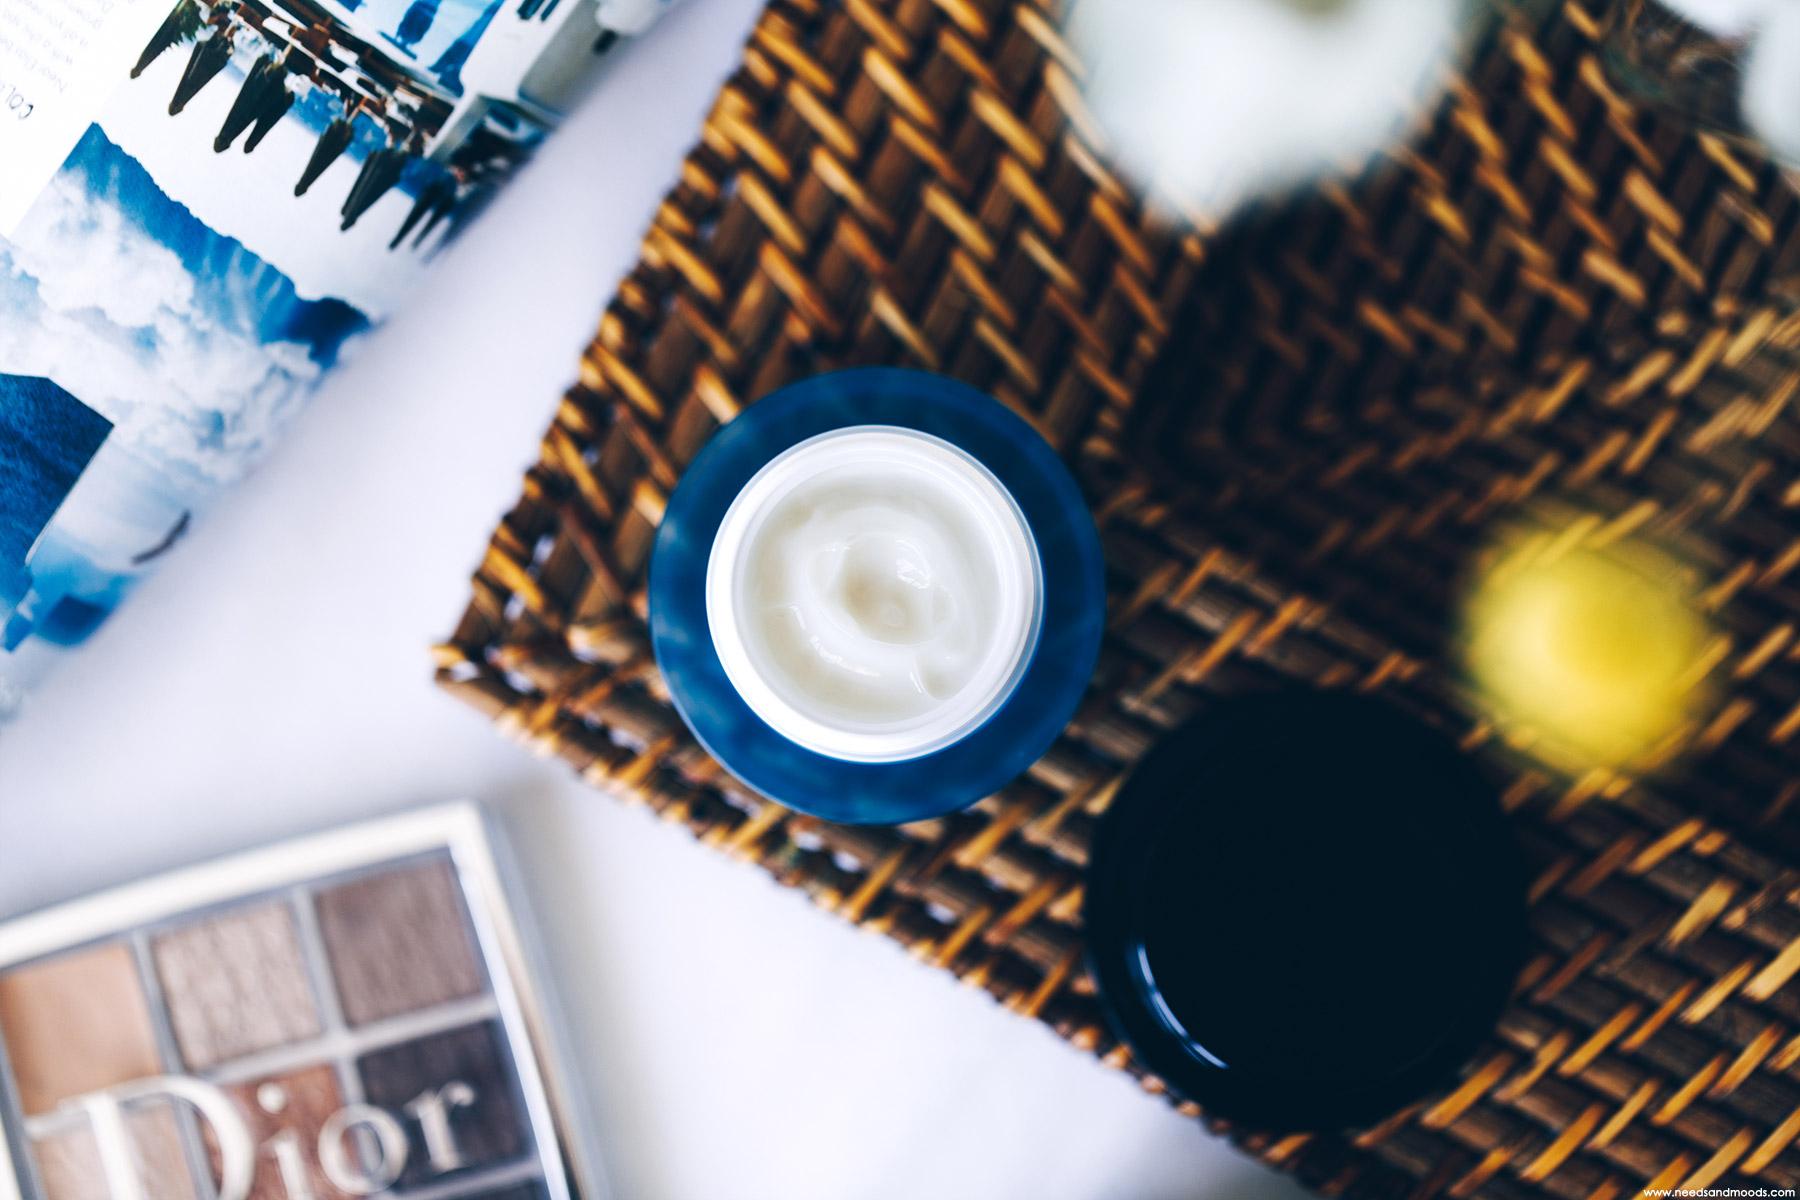 belif moisturizing eye bomb test